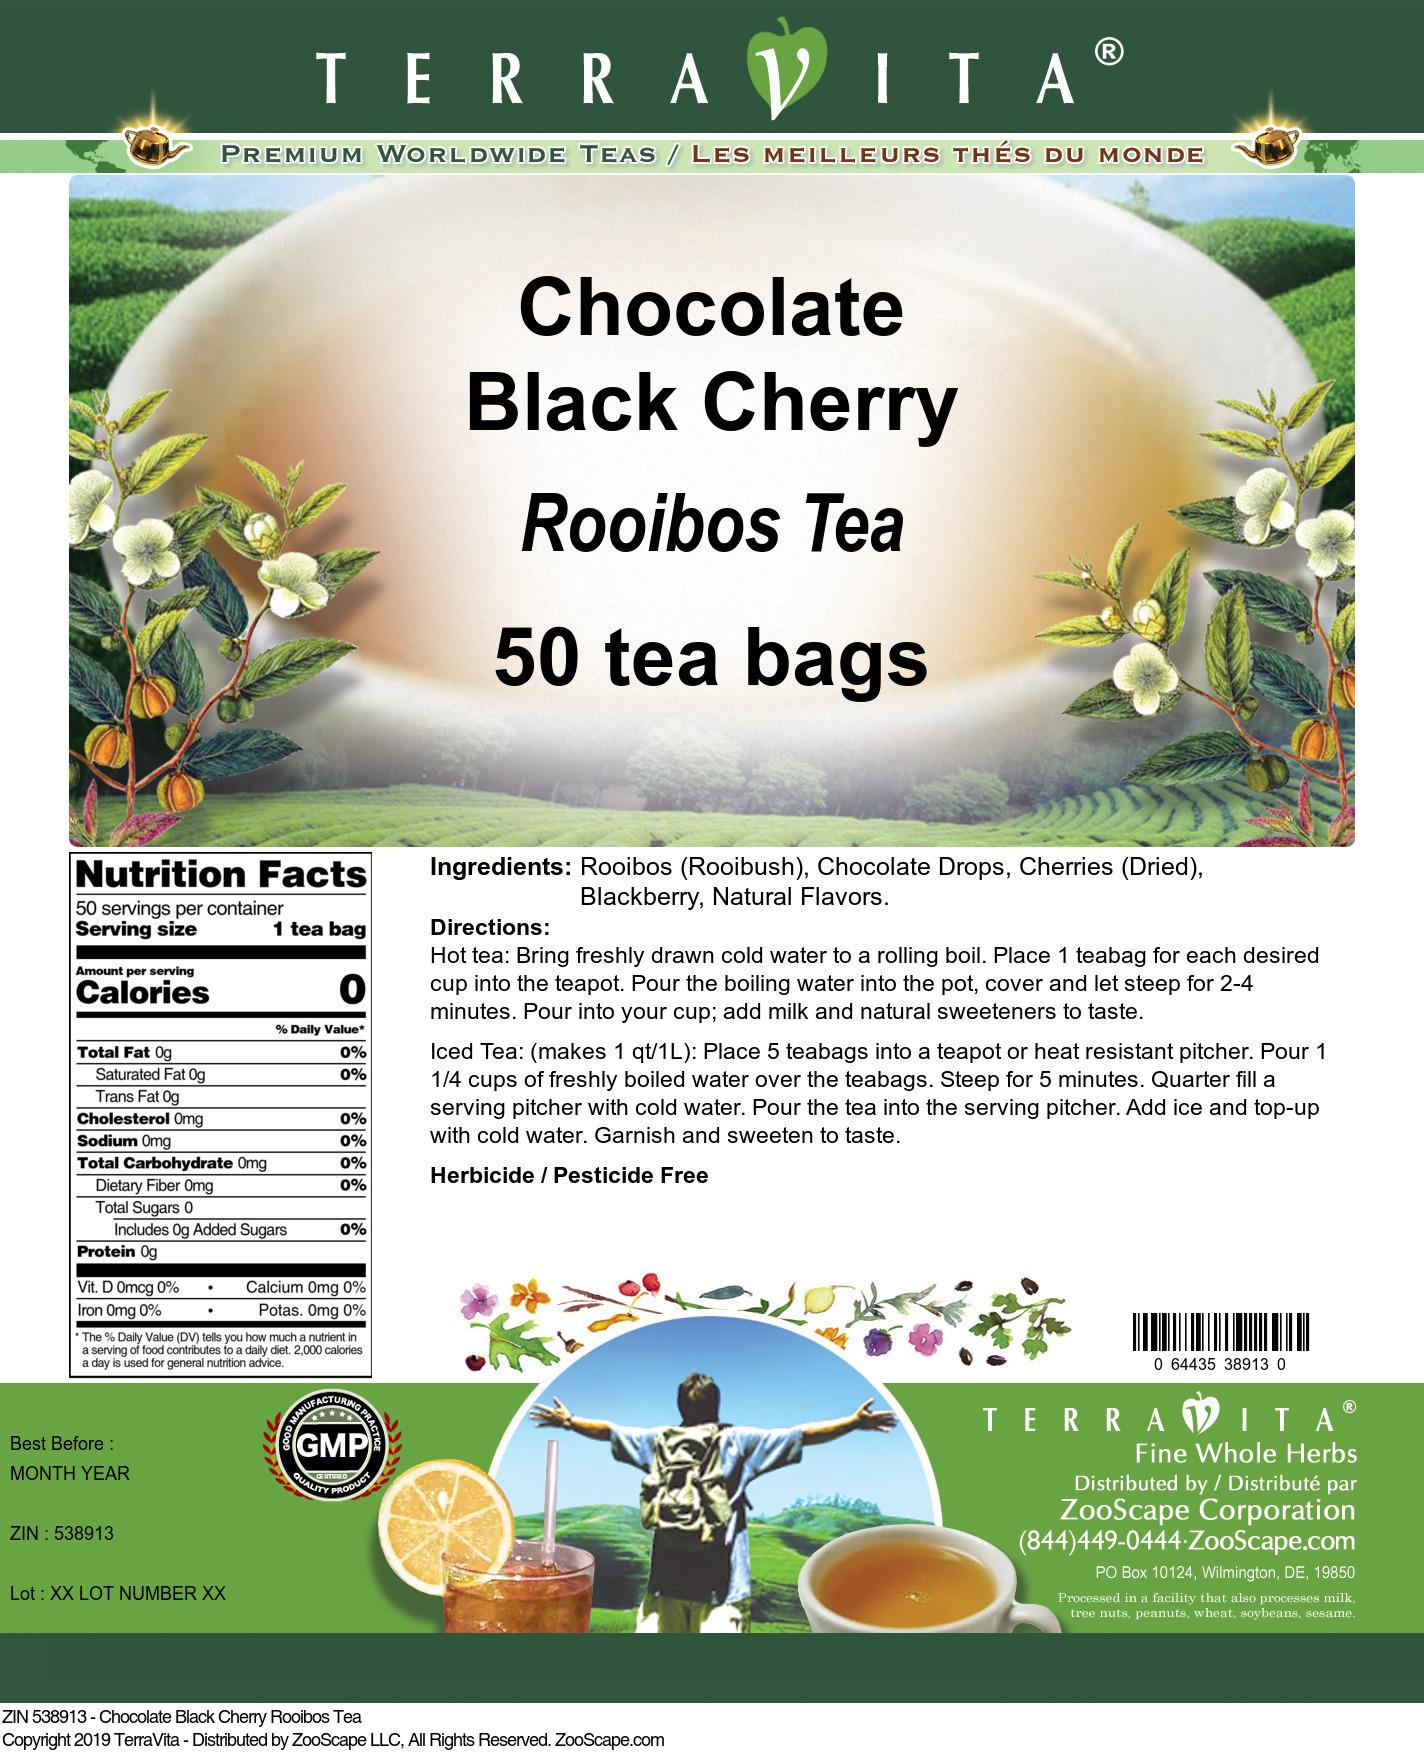 Chocolate Black Cherry Rooibos Tea